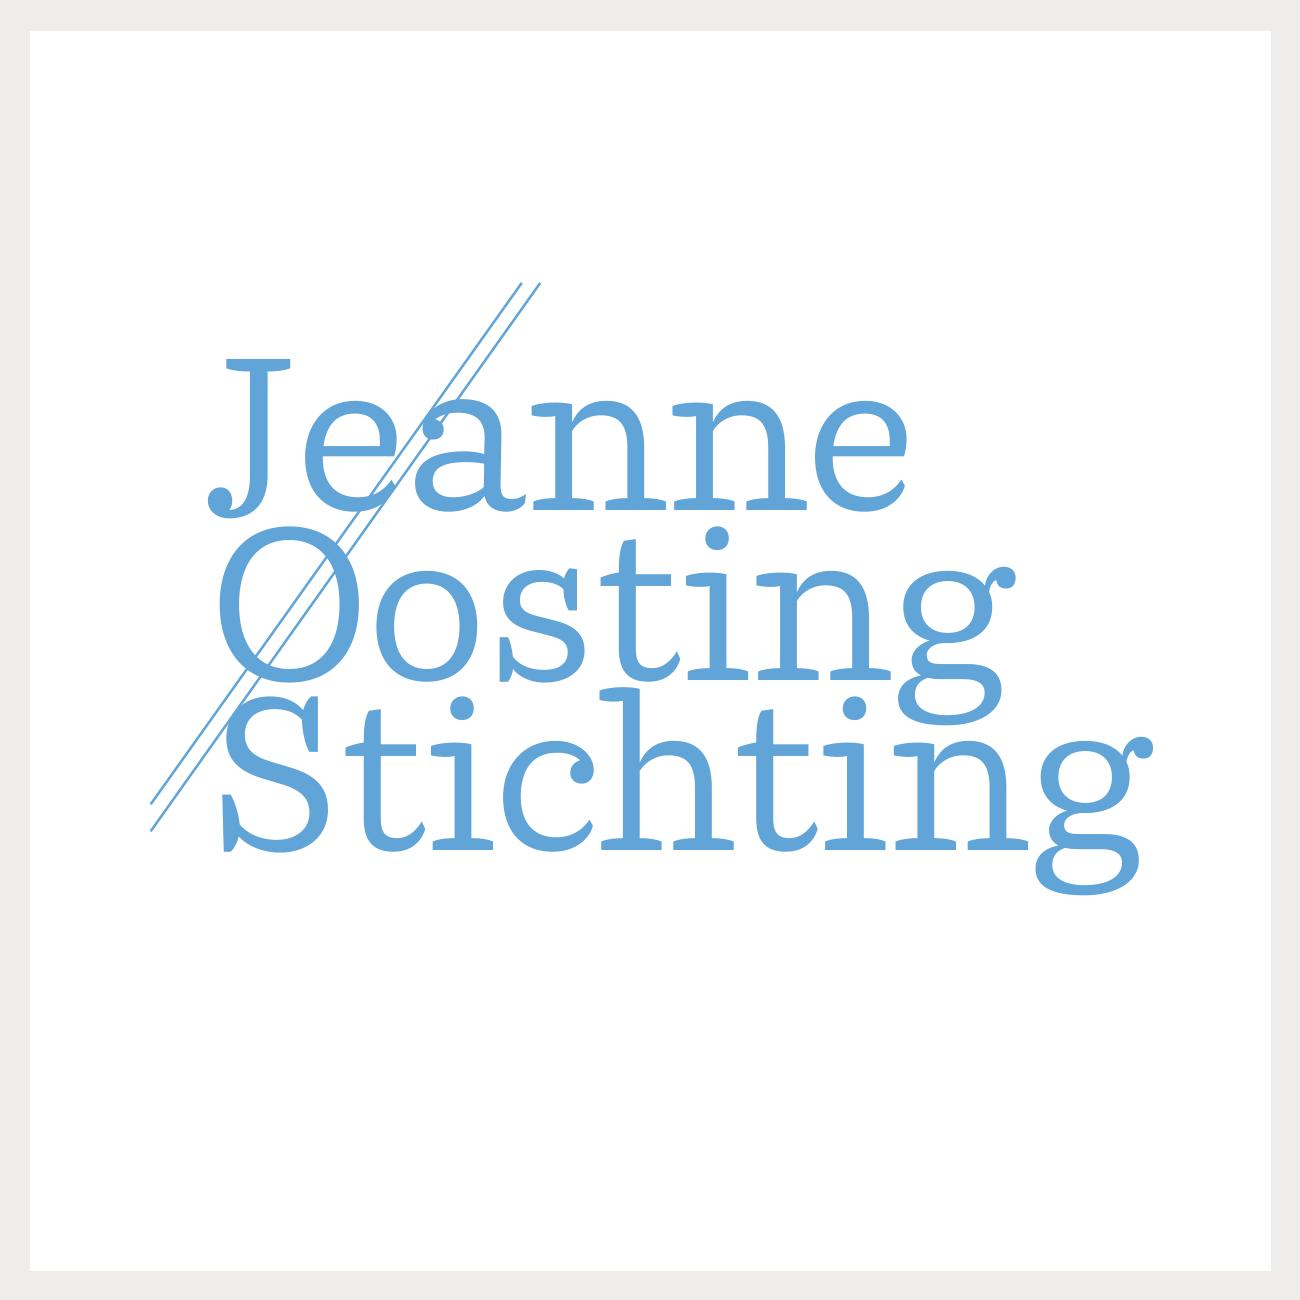 Identiteit voor de Jeanne Oosting Stichting